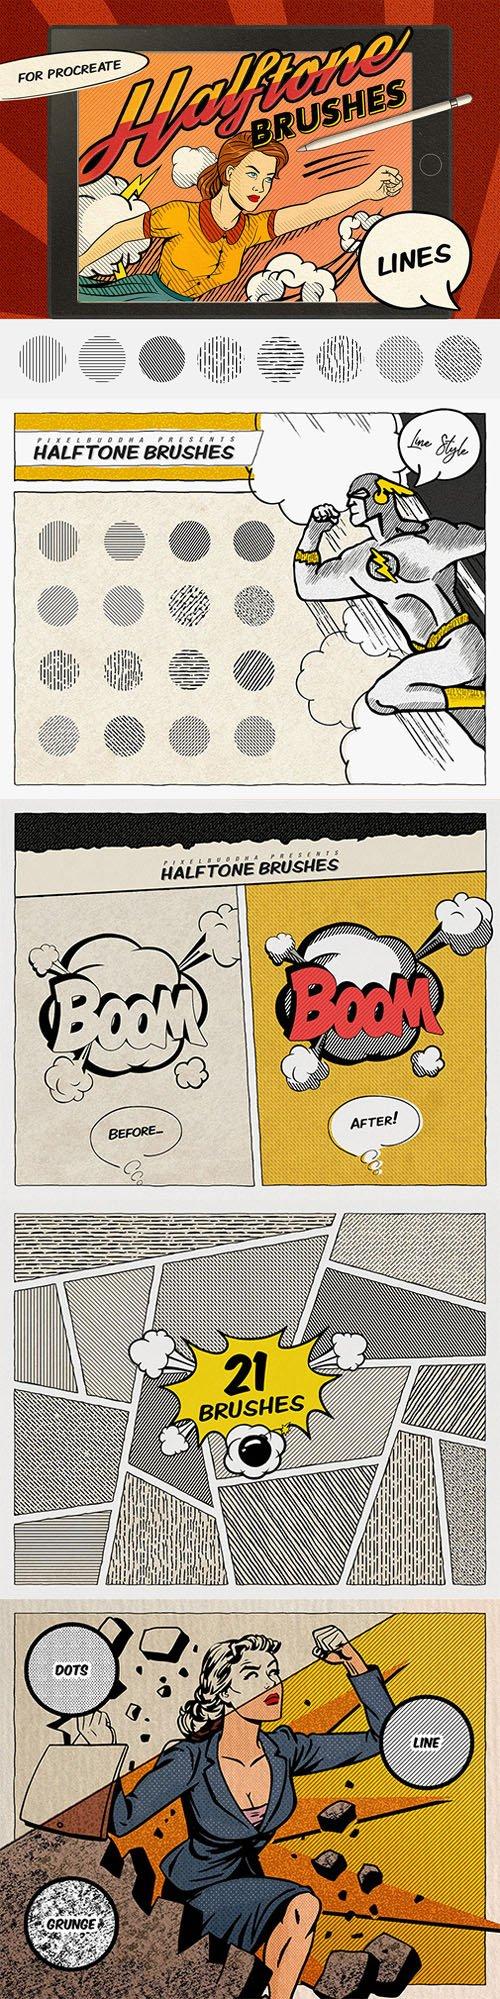 21 Comics Halftone Brushes for Procreate